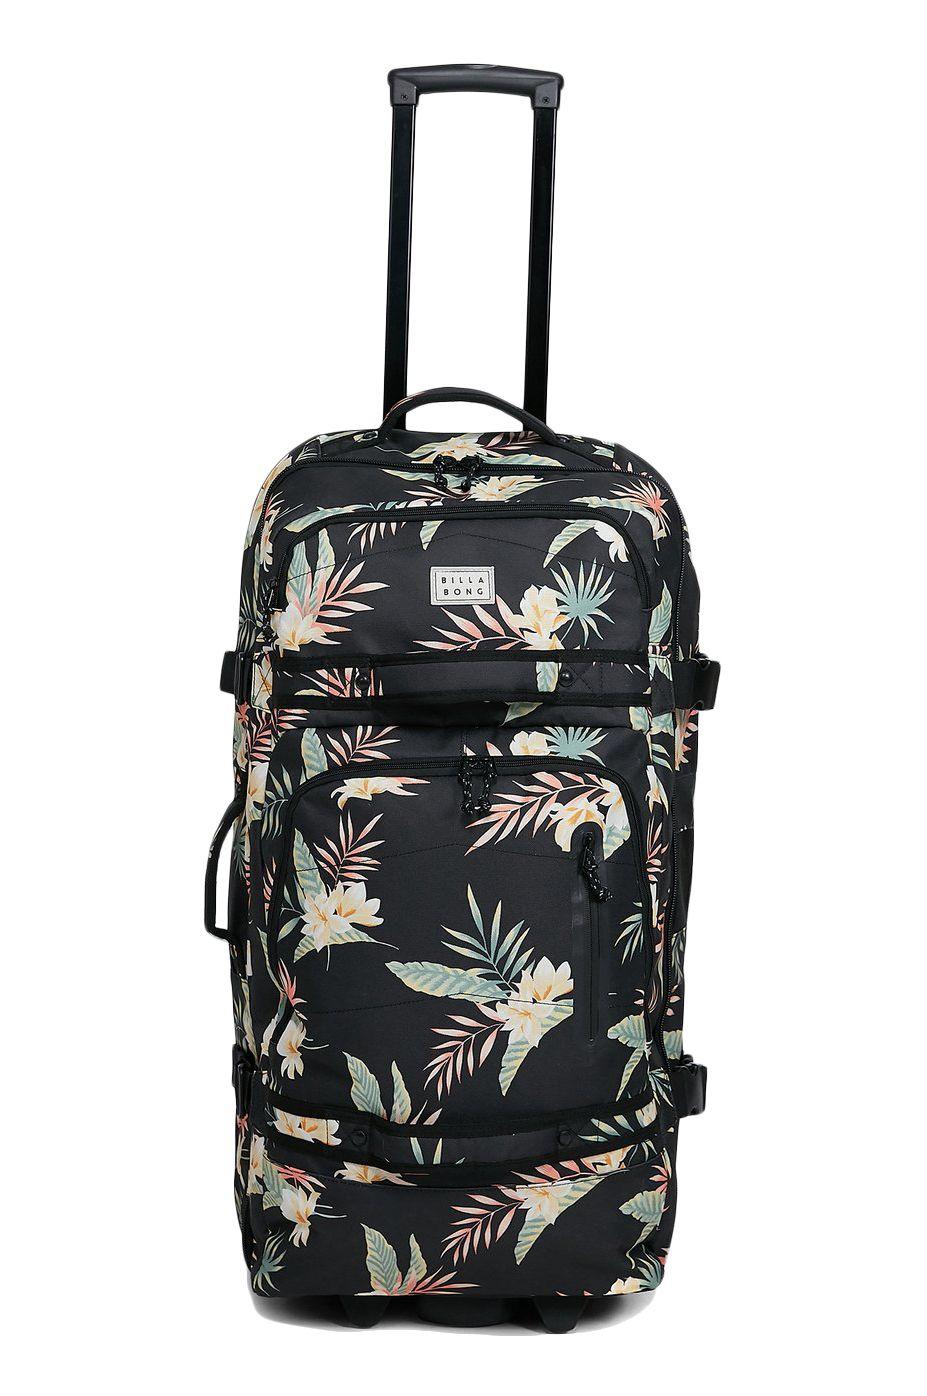 Billabong Travelbag KEEP IT ROLLING Black/Green